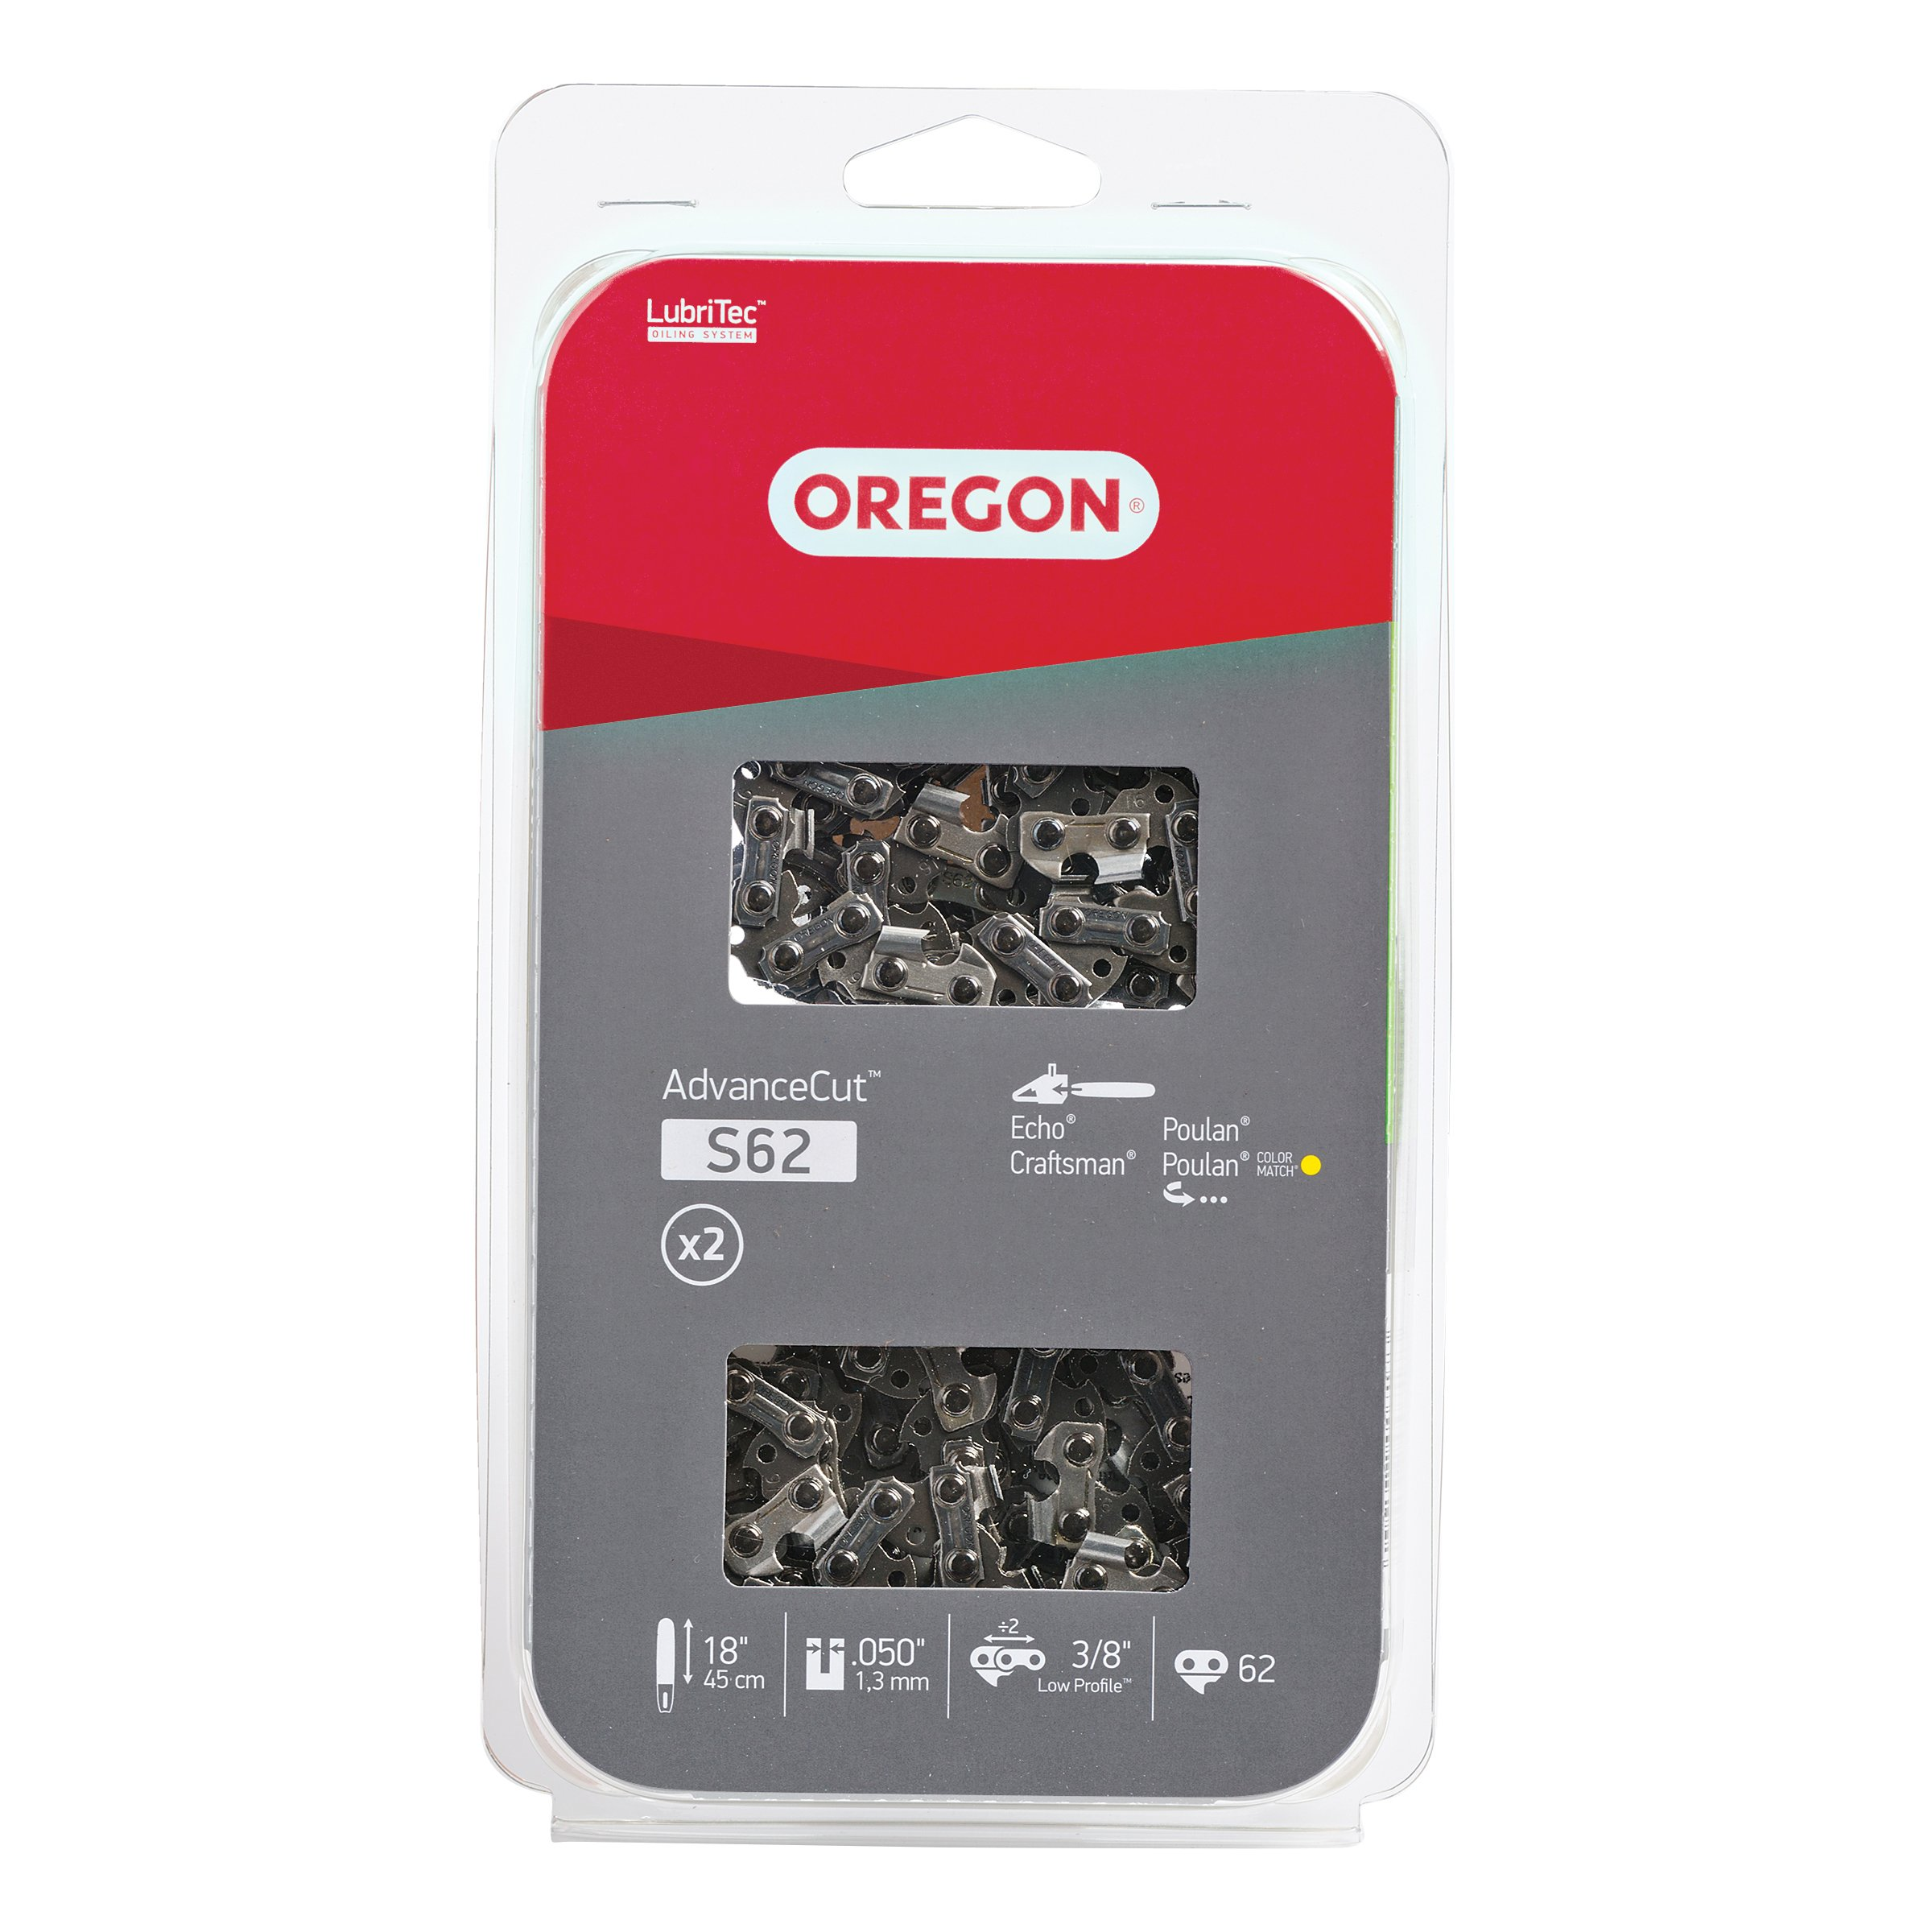 Oregon S62T AdvanceCut 18-Inch Chainsaw Chain, Fits Echo, Craftsman, Poulan (2-Pack) by Oregon